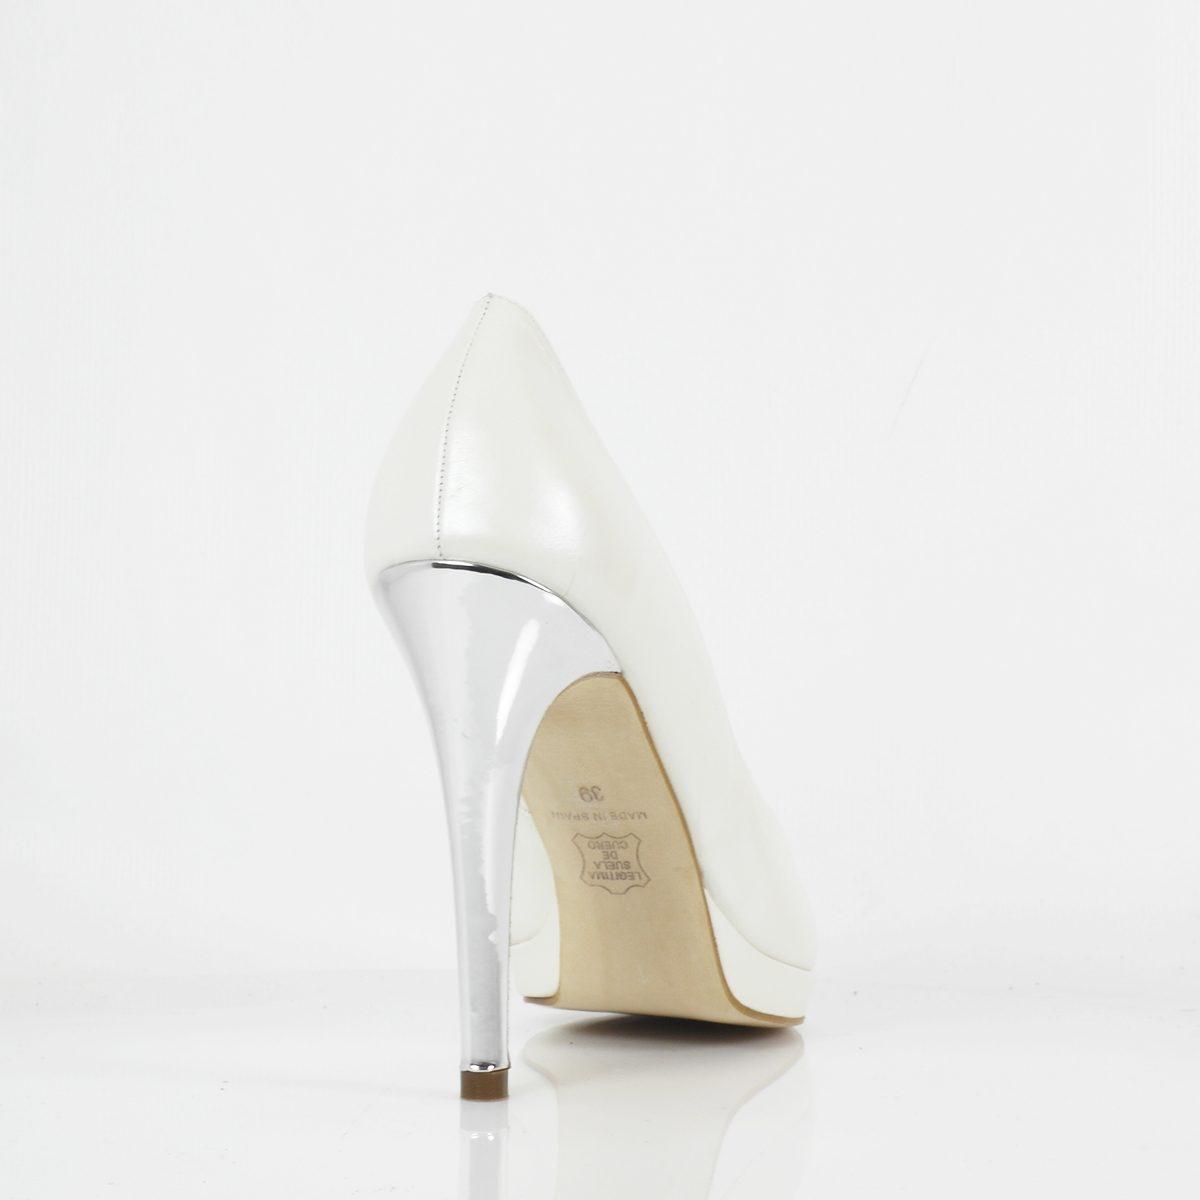 SALON MOD.1833 (11cm) - Zapatos Personalizados Fiesta